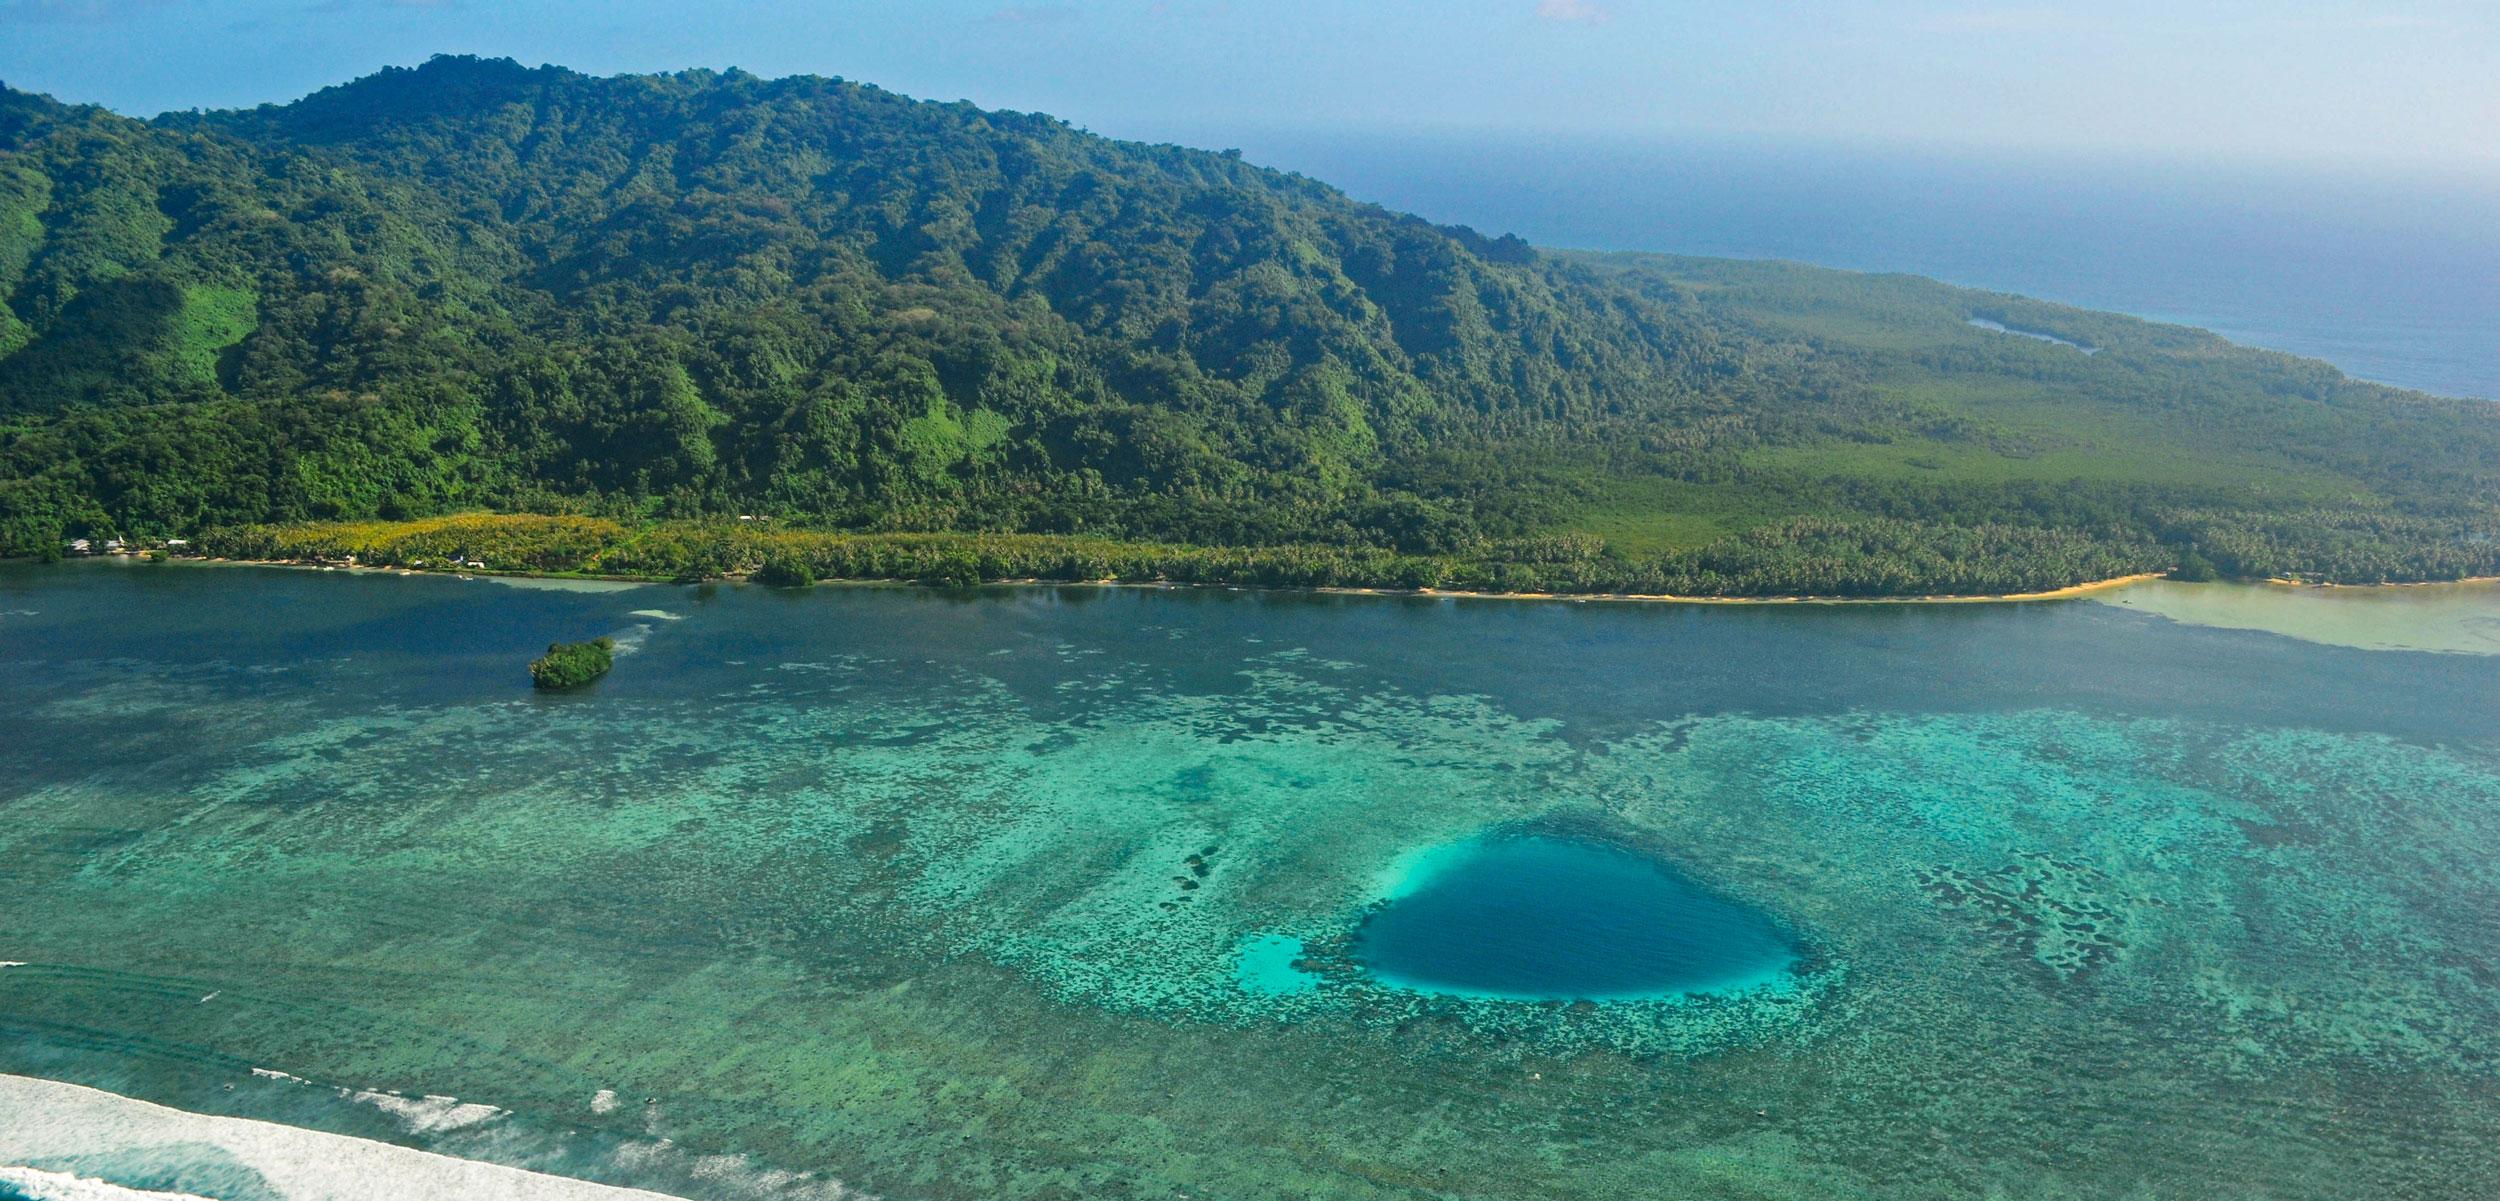 Green tropical landmass surrounded by light blue ocean